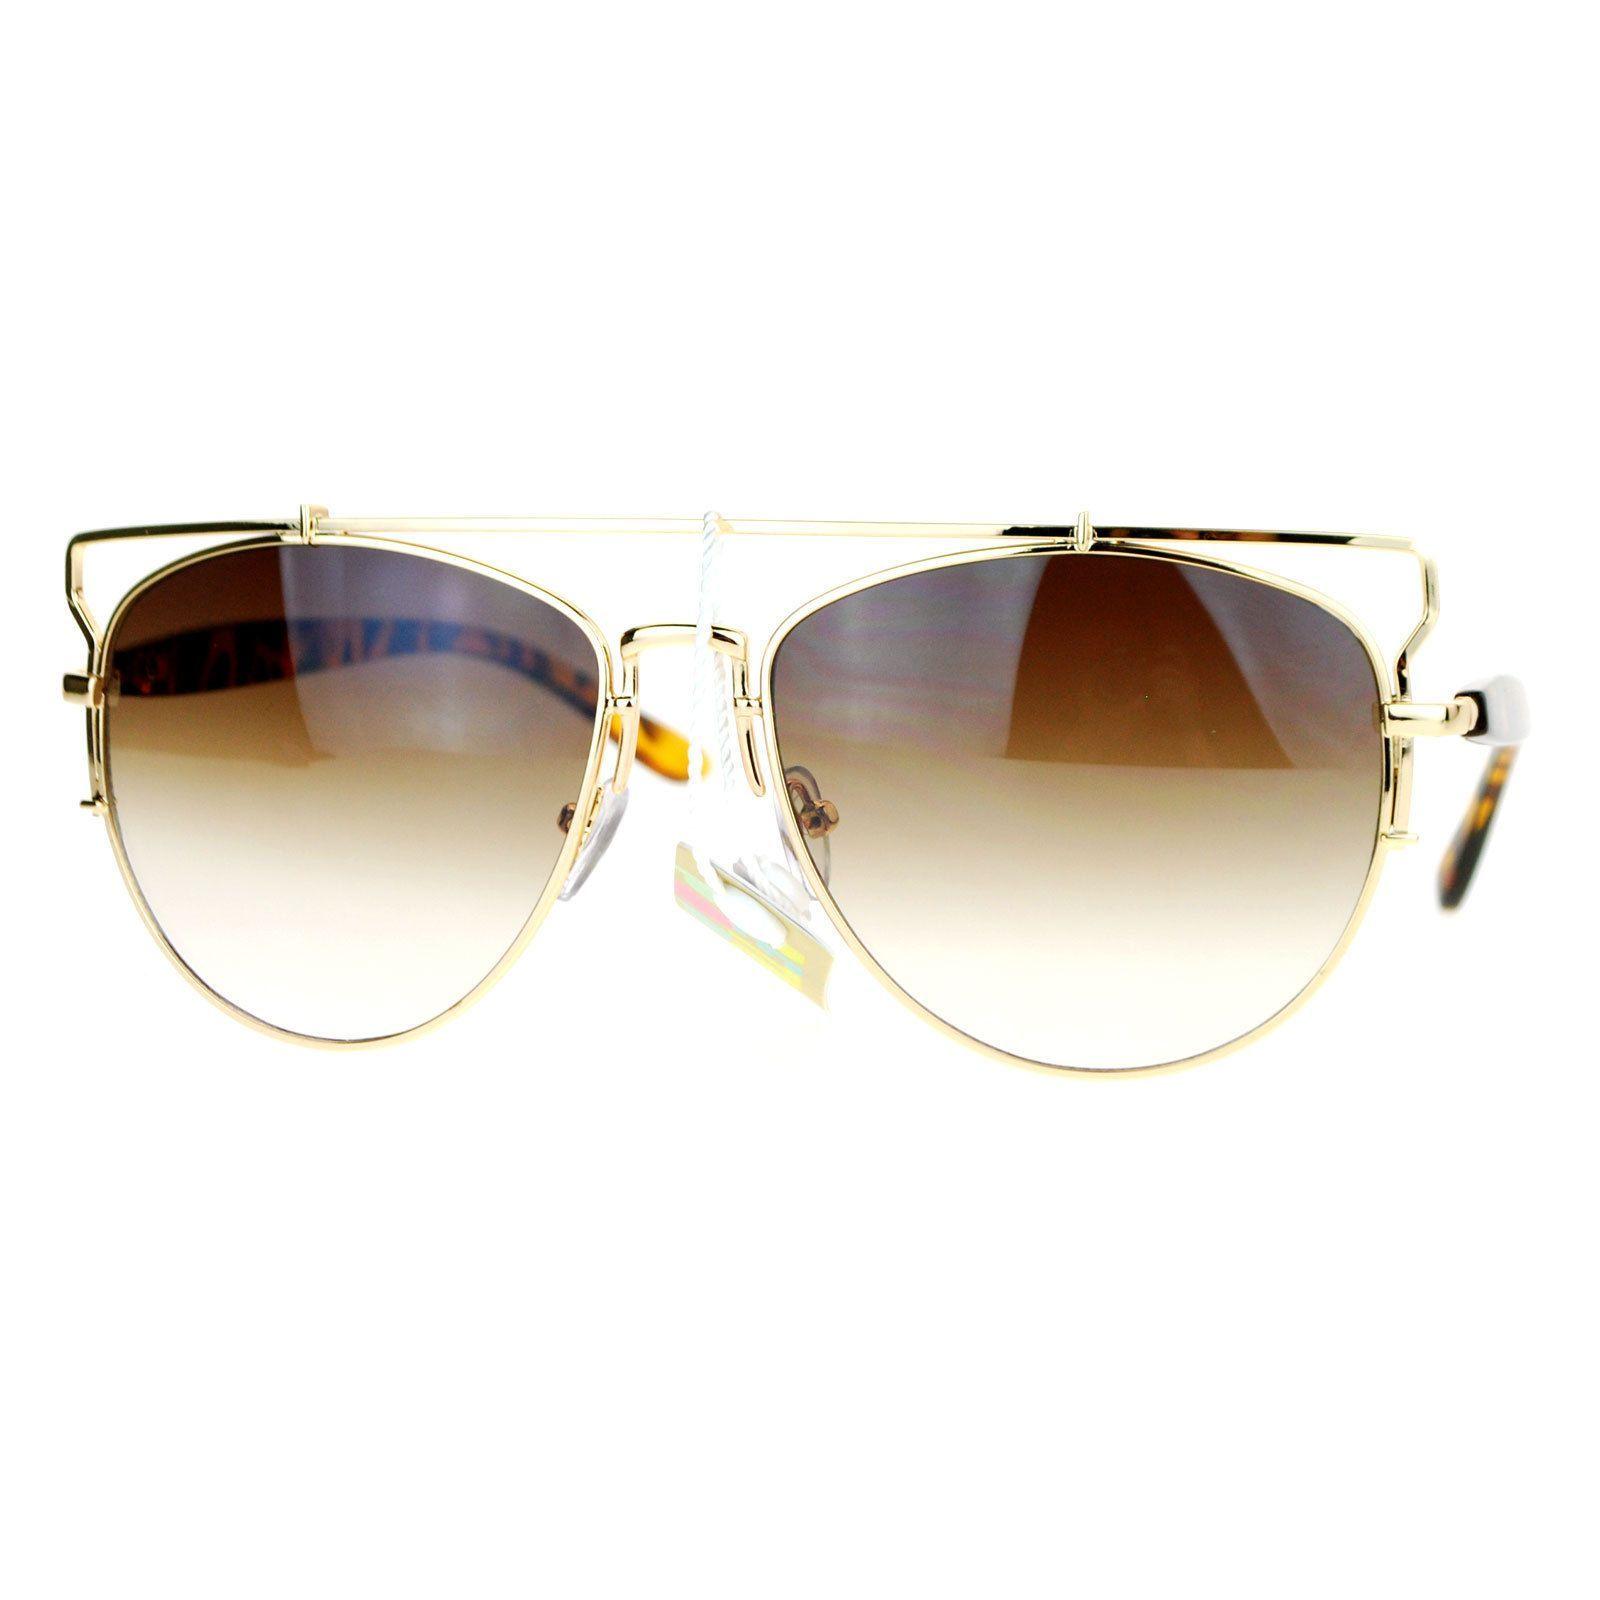 Womens Designer Aviator Sunglasses Flat Top Bar Metal Frame Aviators